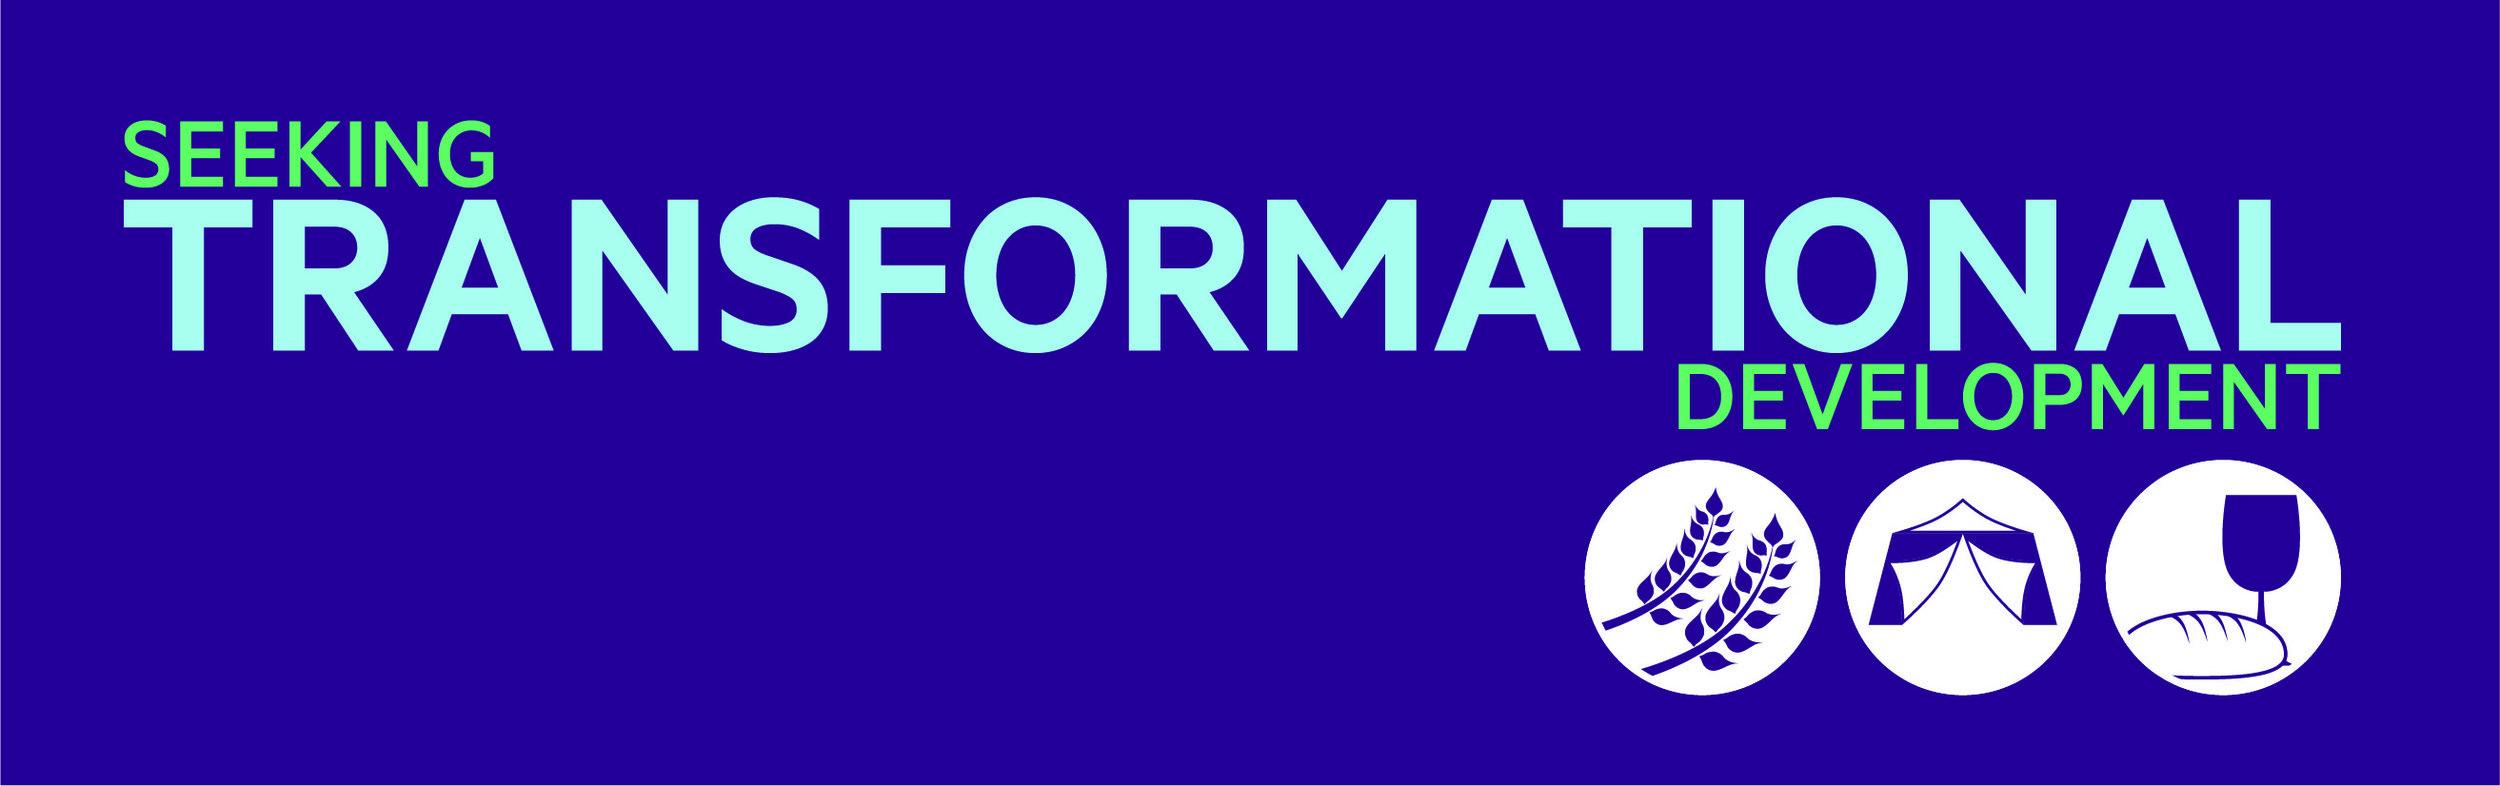 Transformational-Dev.-on-purple.jpg